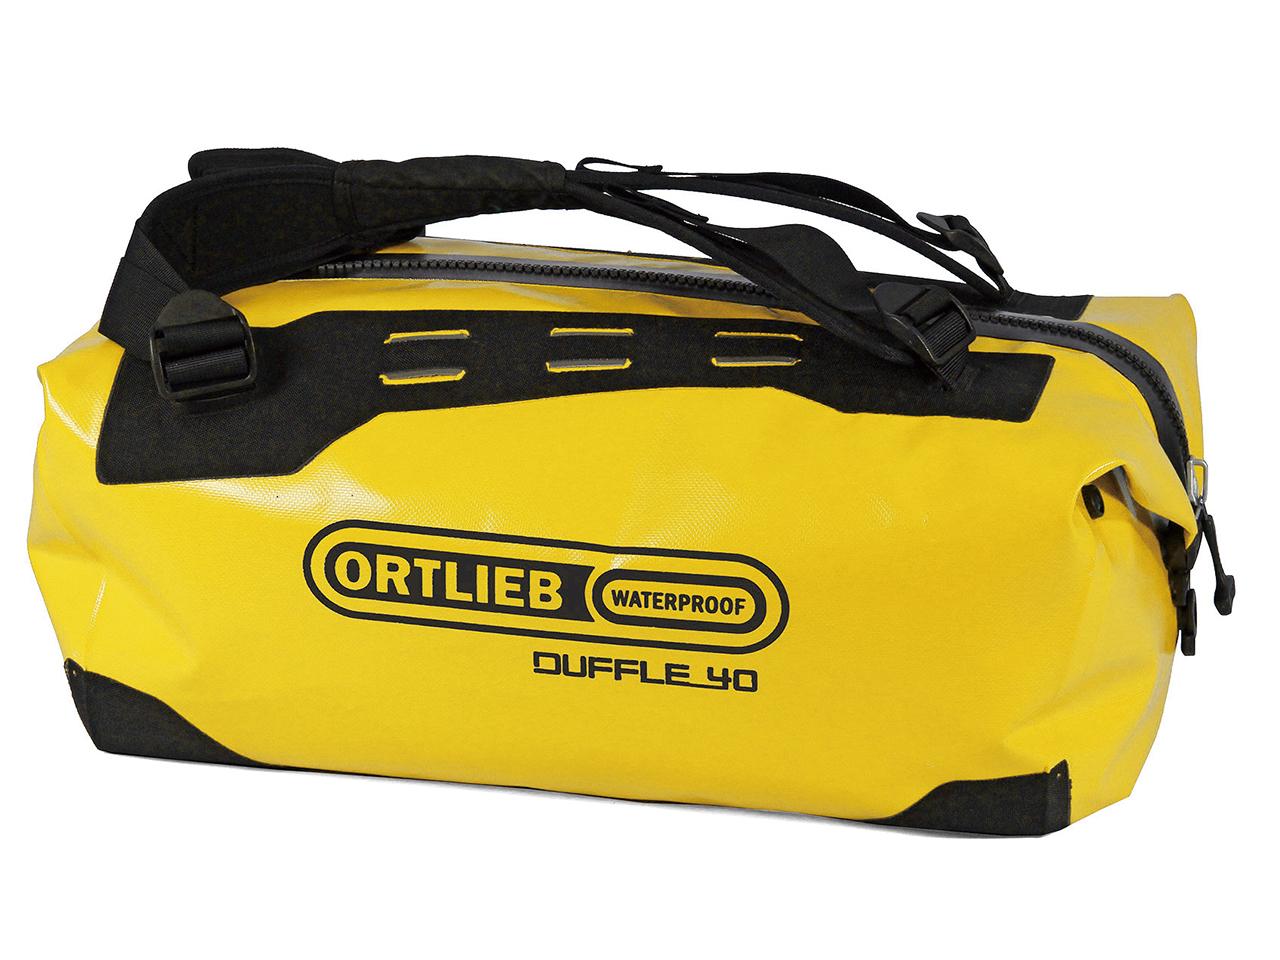 ORTLIEB オルトリーブ ダッフル 40L 71876